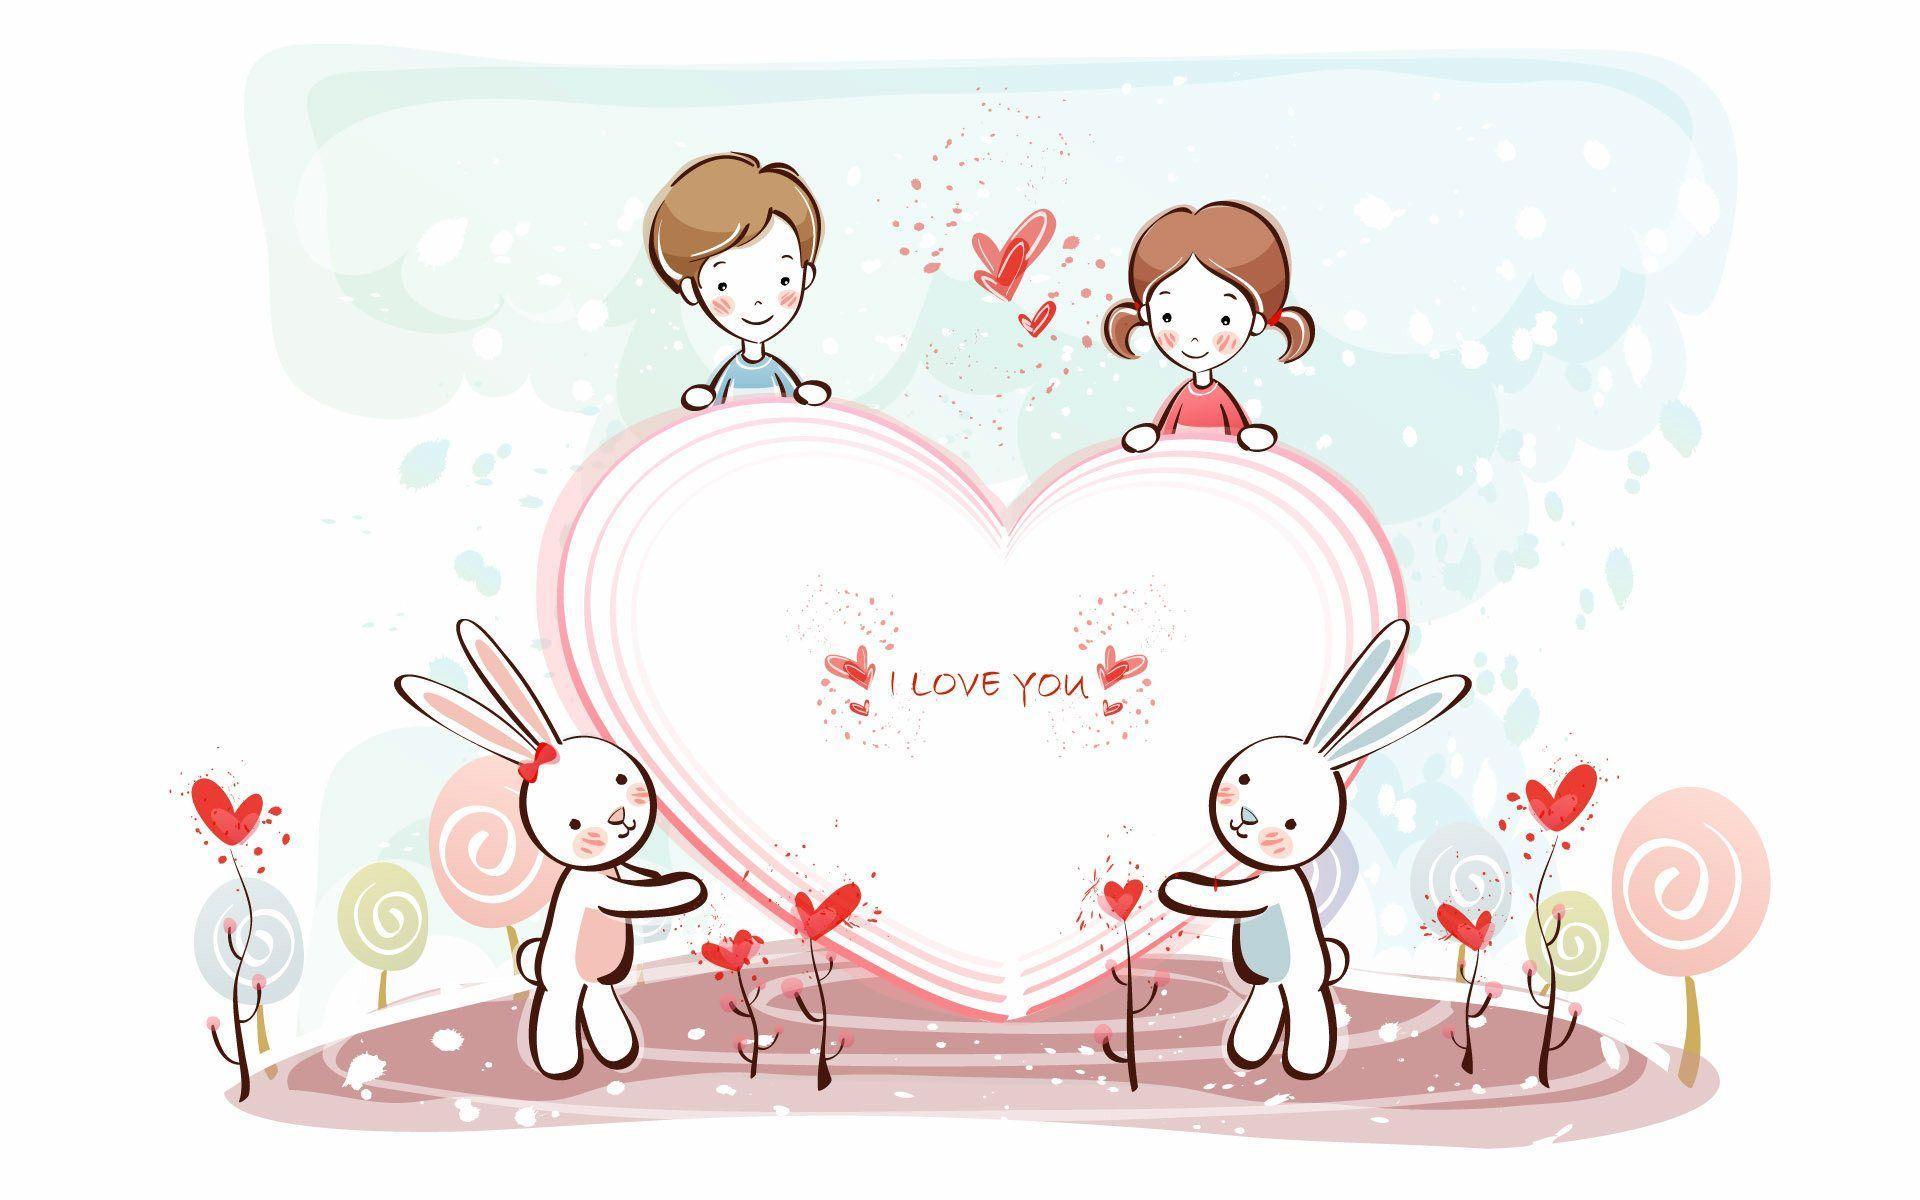 Cute Love Wallpapers For Mobile: Cute Cartoon Couple Wallpapers For Mobile